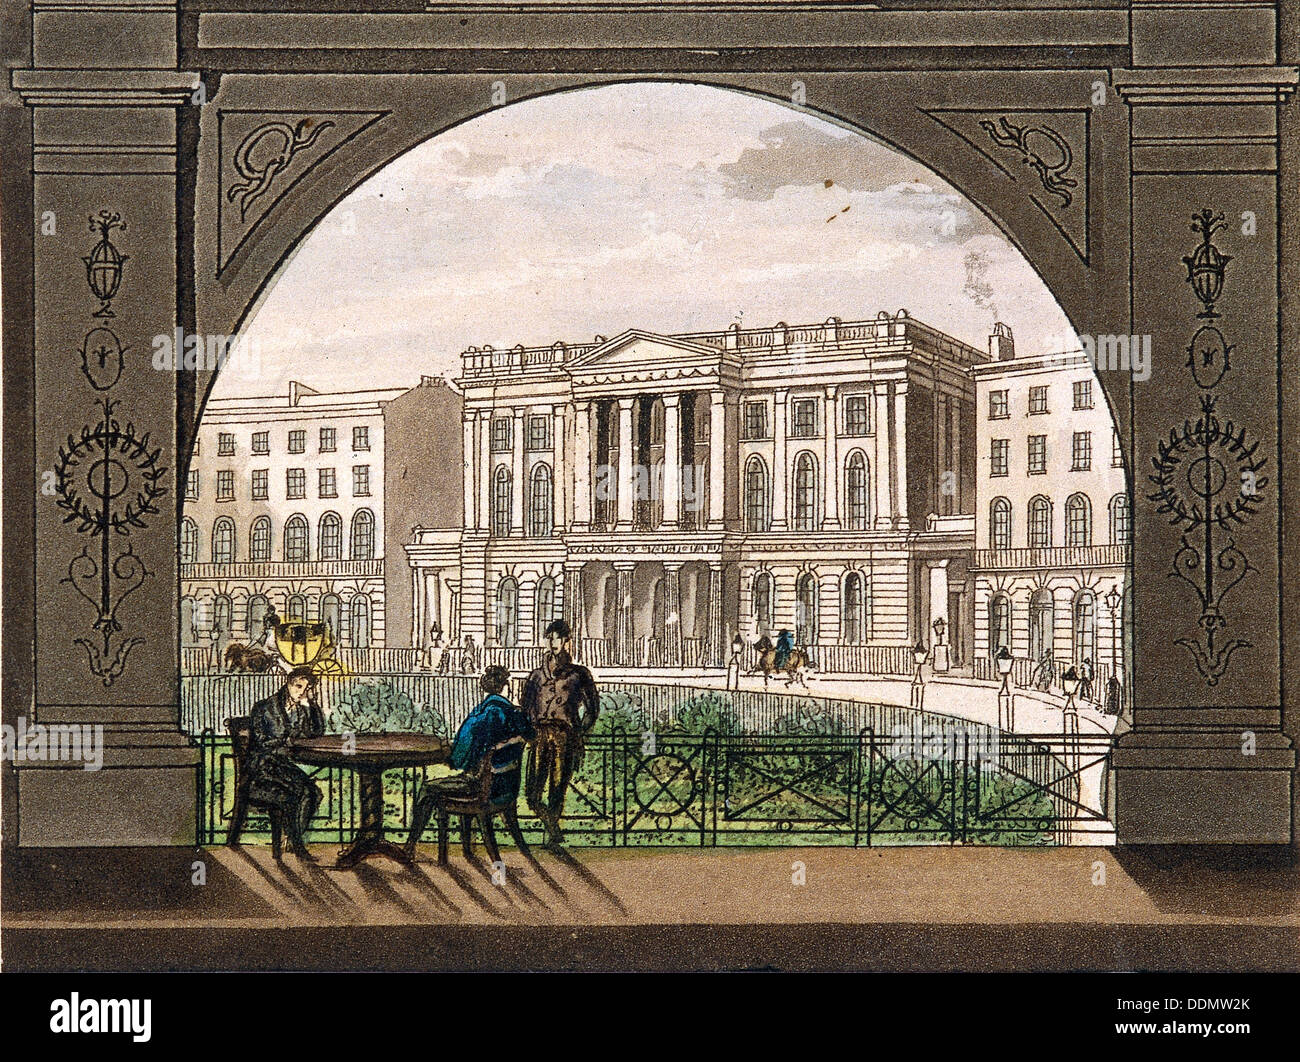 London Institution, Finsbury Circus, c1820. Artist: Anon - Stock Image